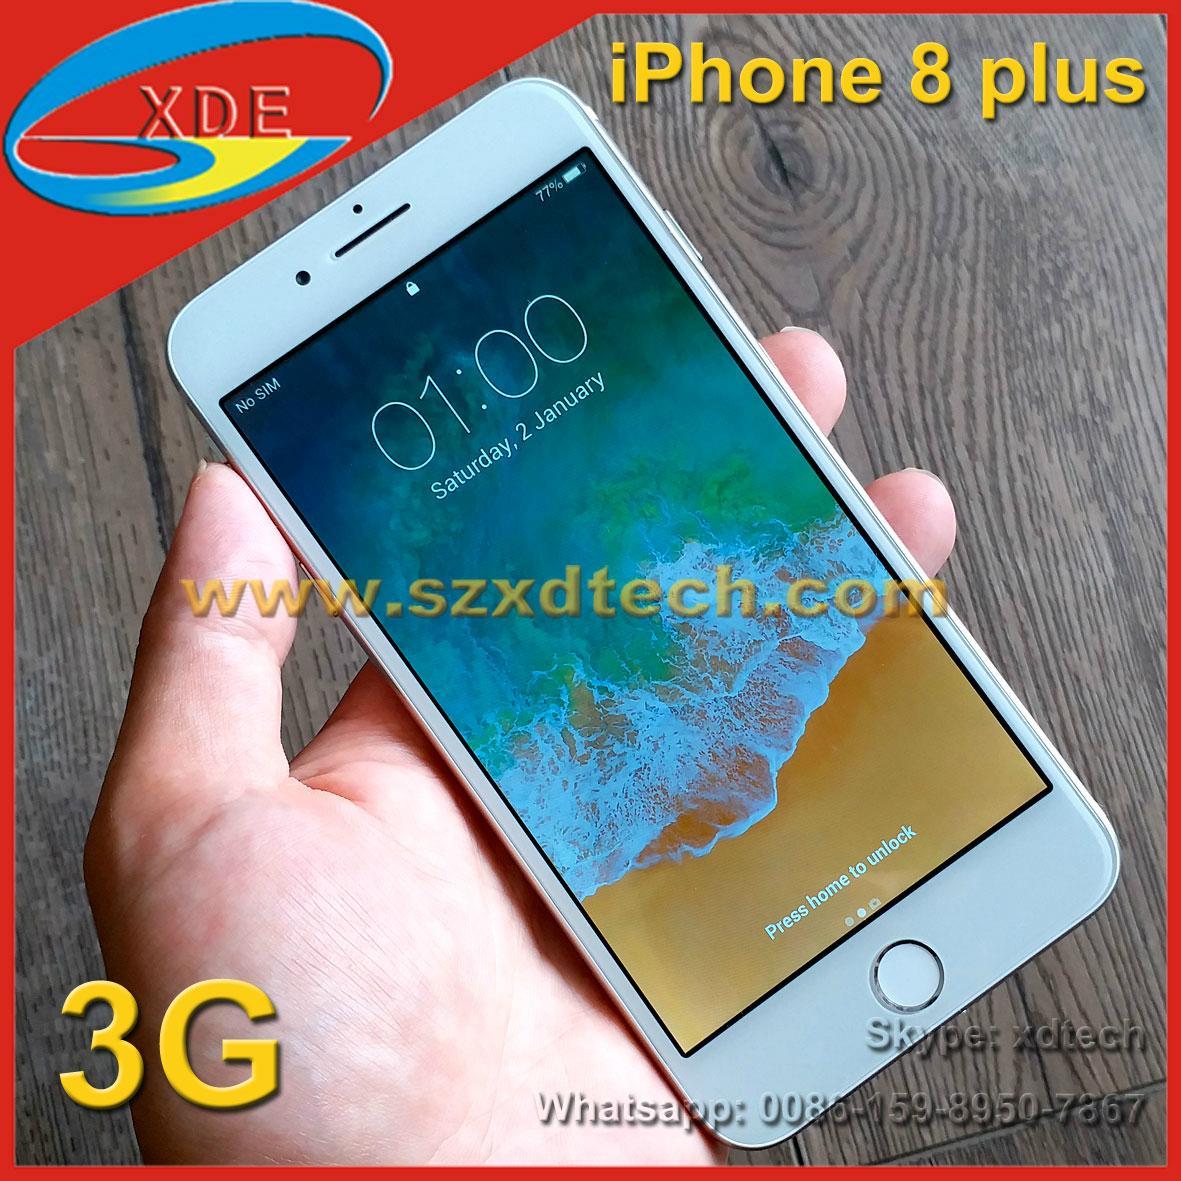 Unlocked 5 5 inch iPhone 8 Plus iPhone 8+ Clone High